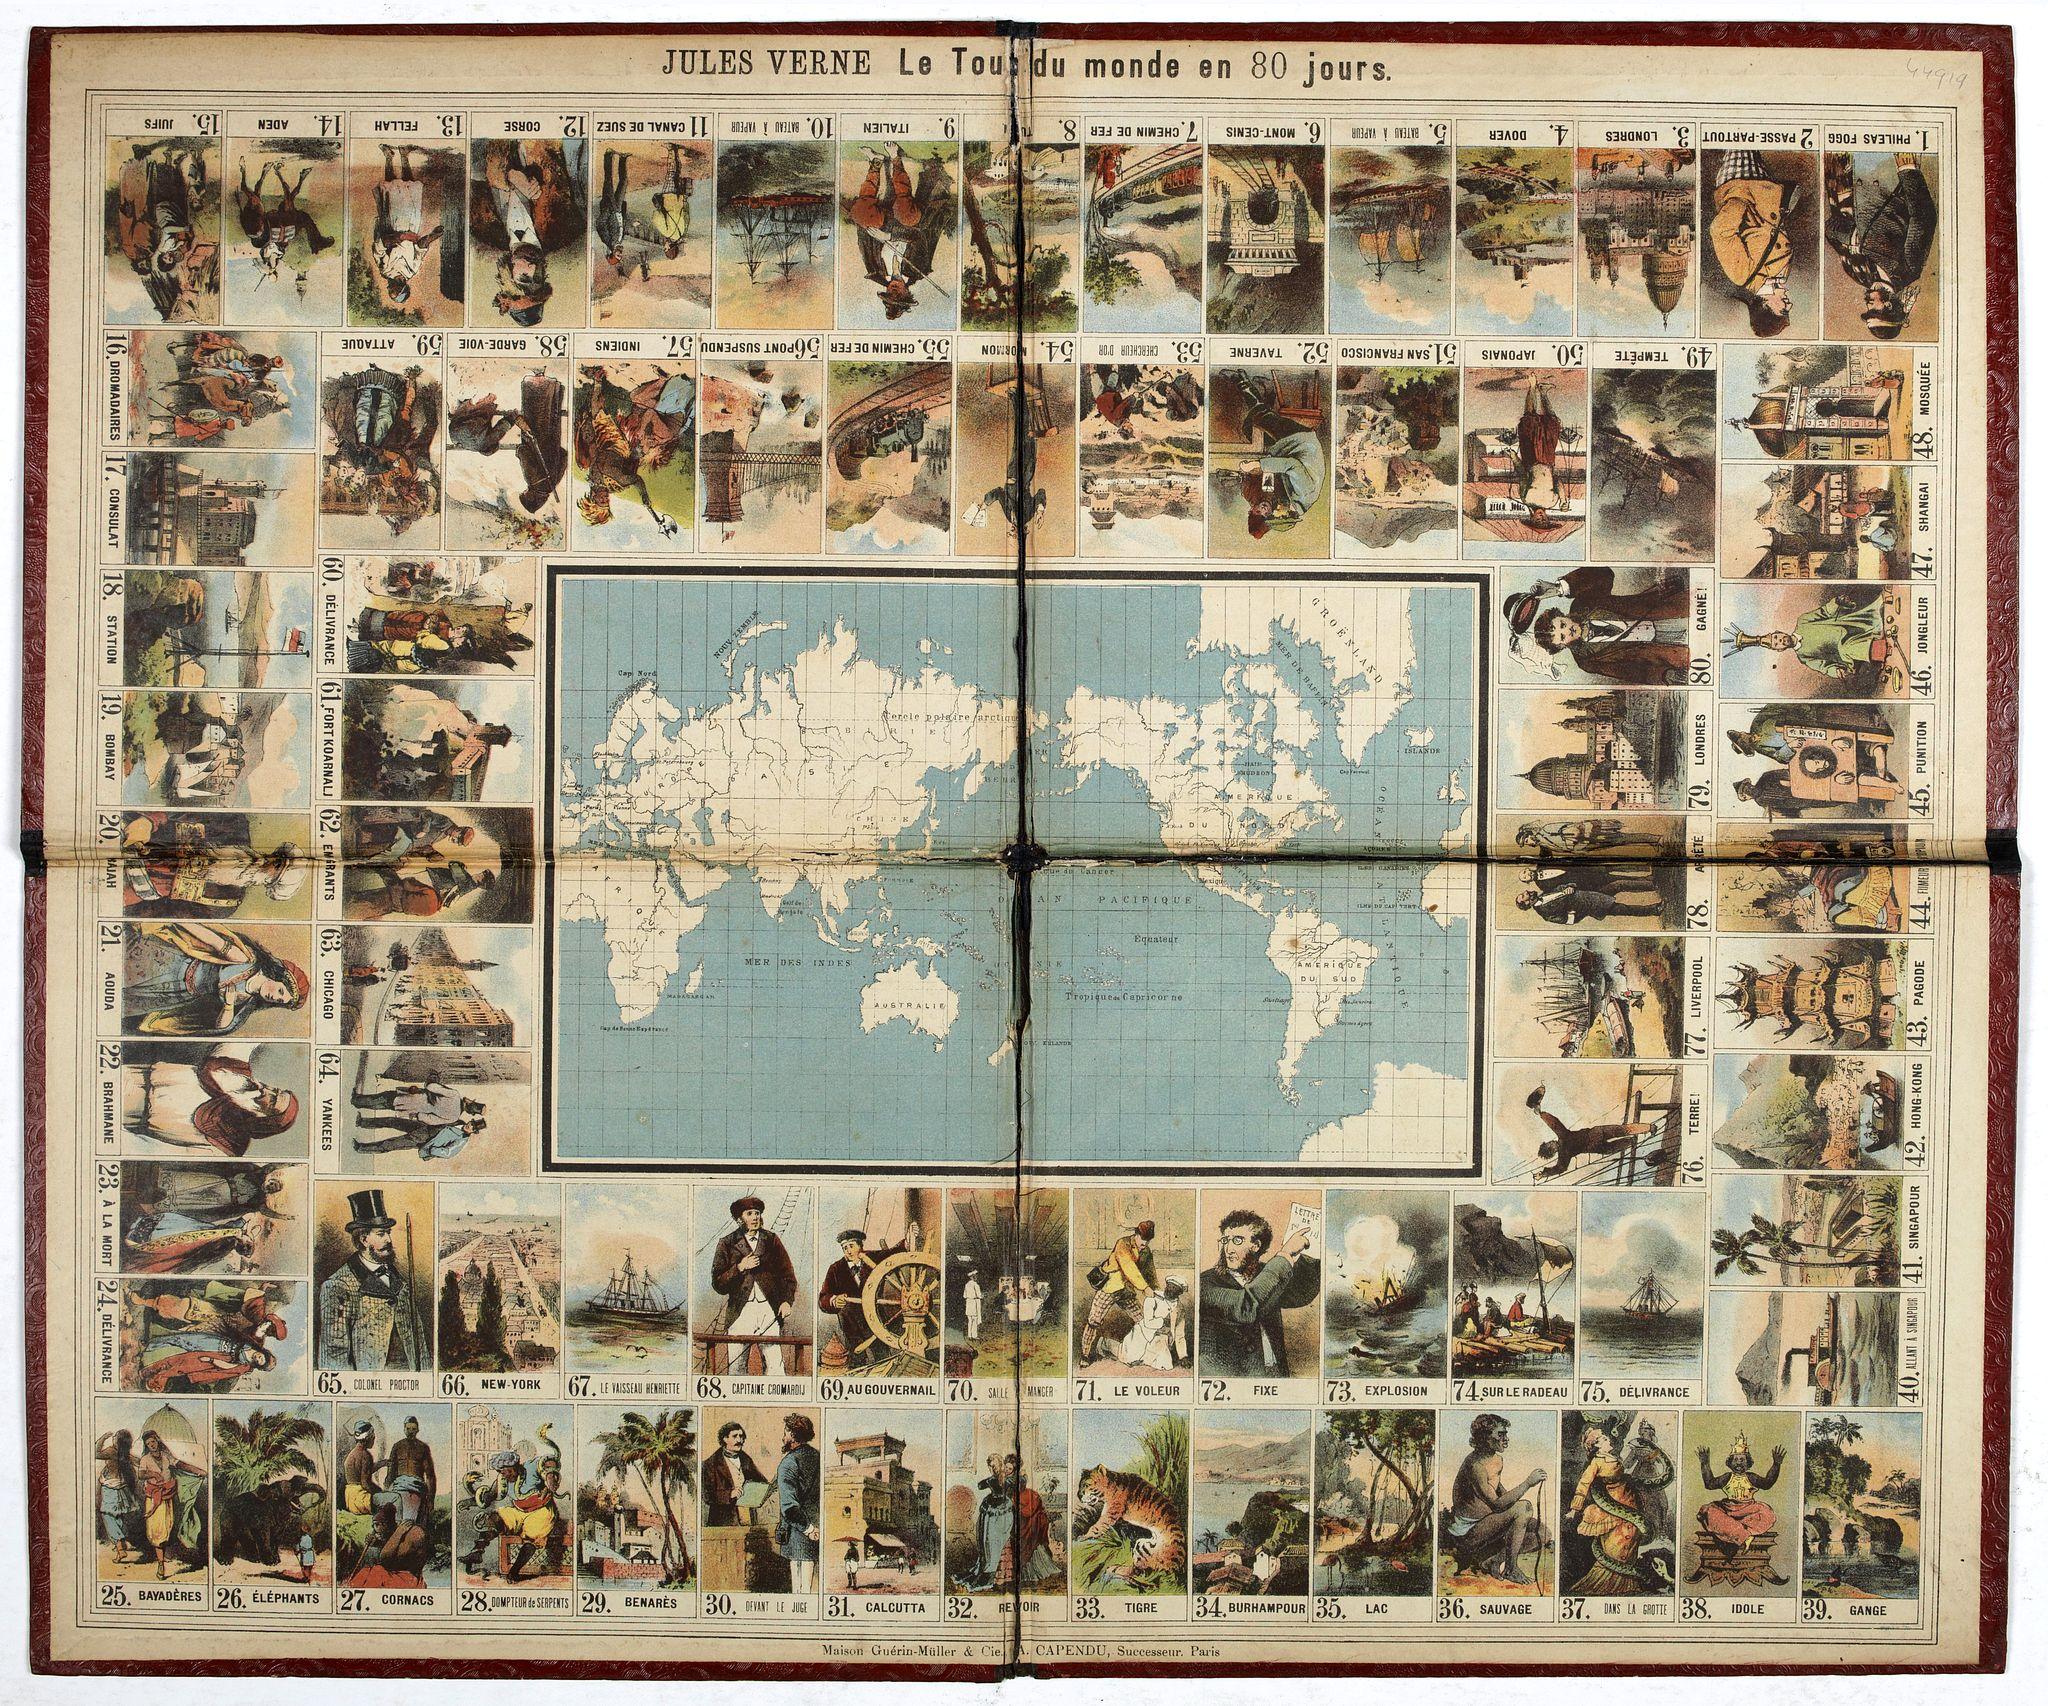 GUERIN-MULLER & CIE. / CAPENDU, A. -  Jules Verne Le Tour du Monde en 80 jours. [Goose game board inspired by Jules Verne's novel Tour du Monde en 80 jours.]